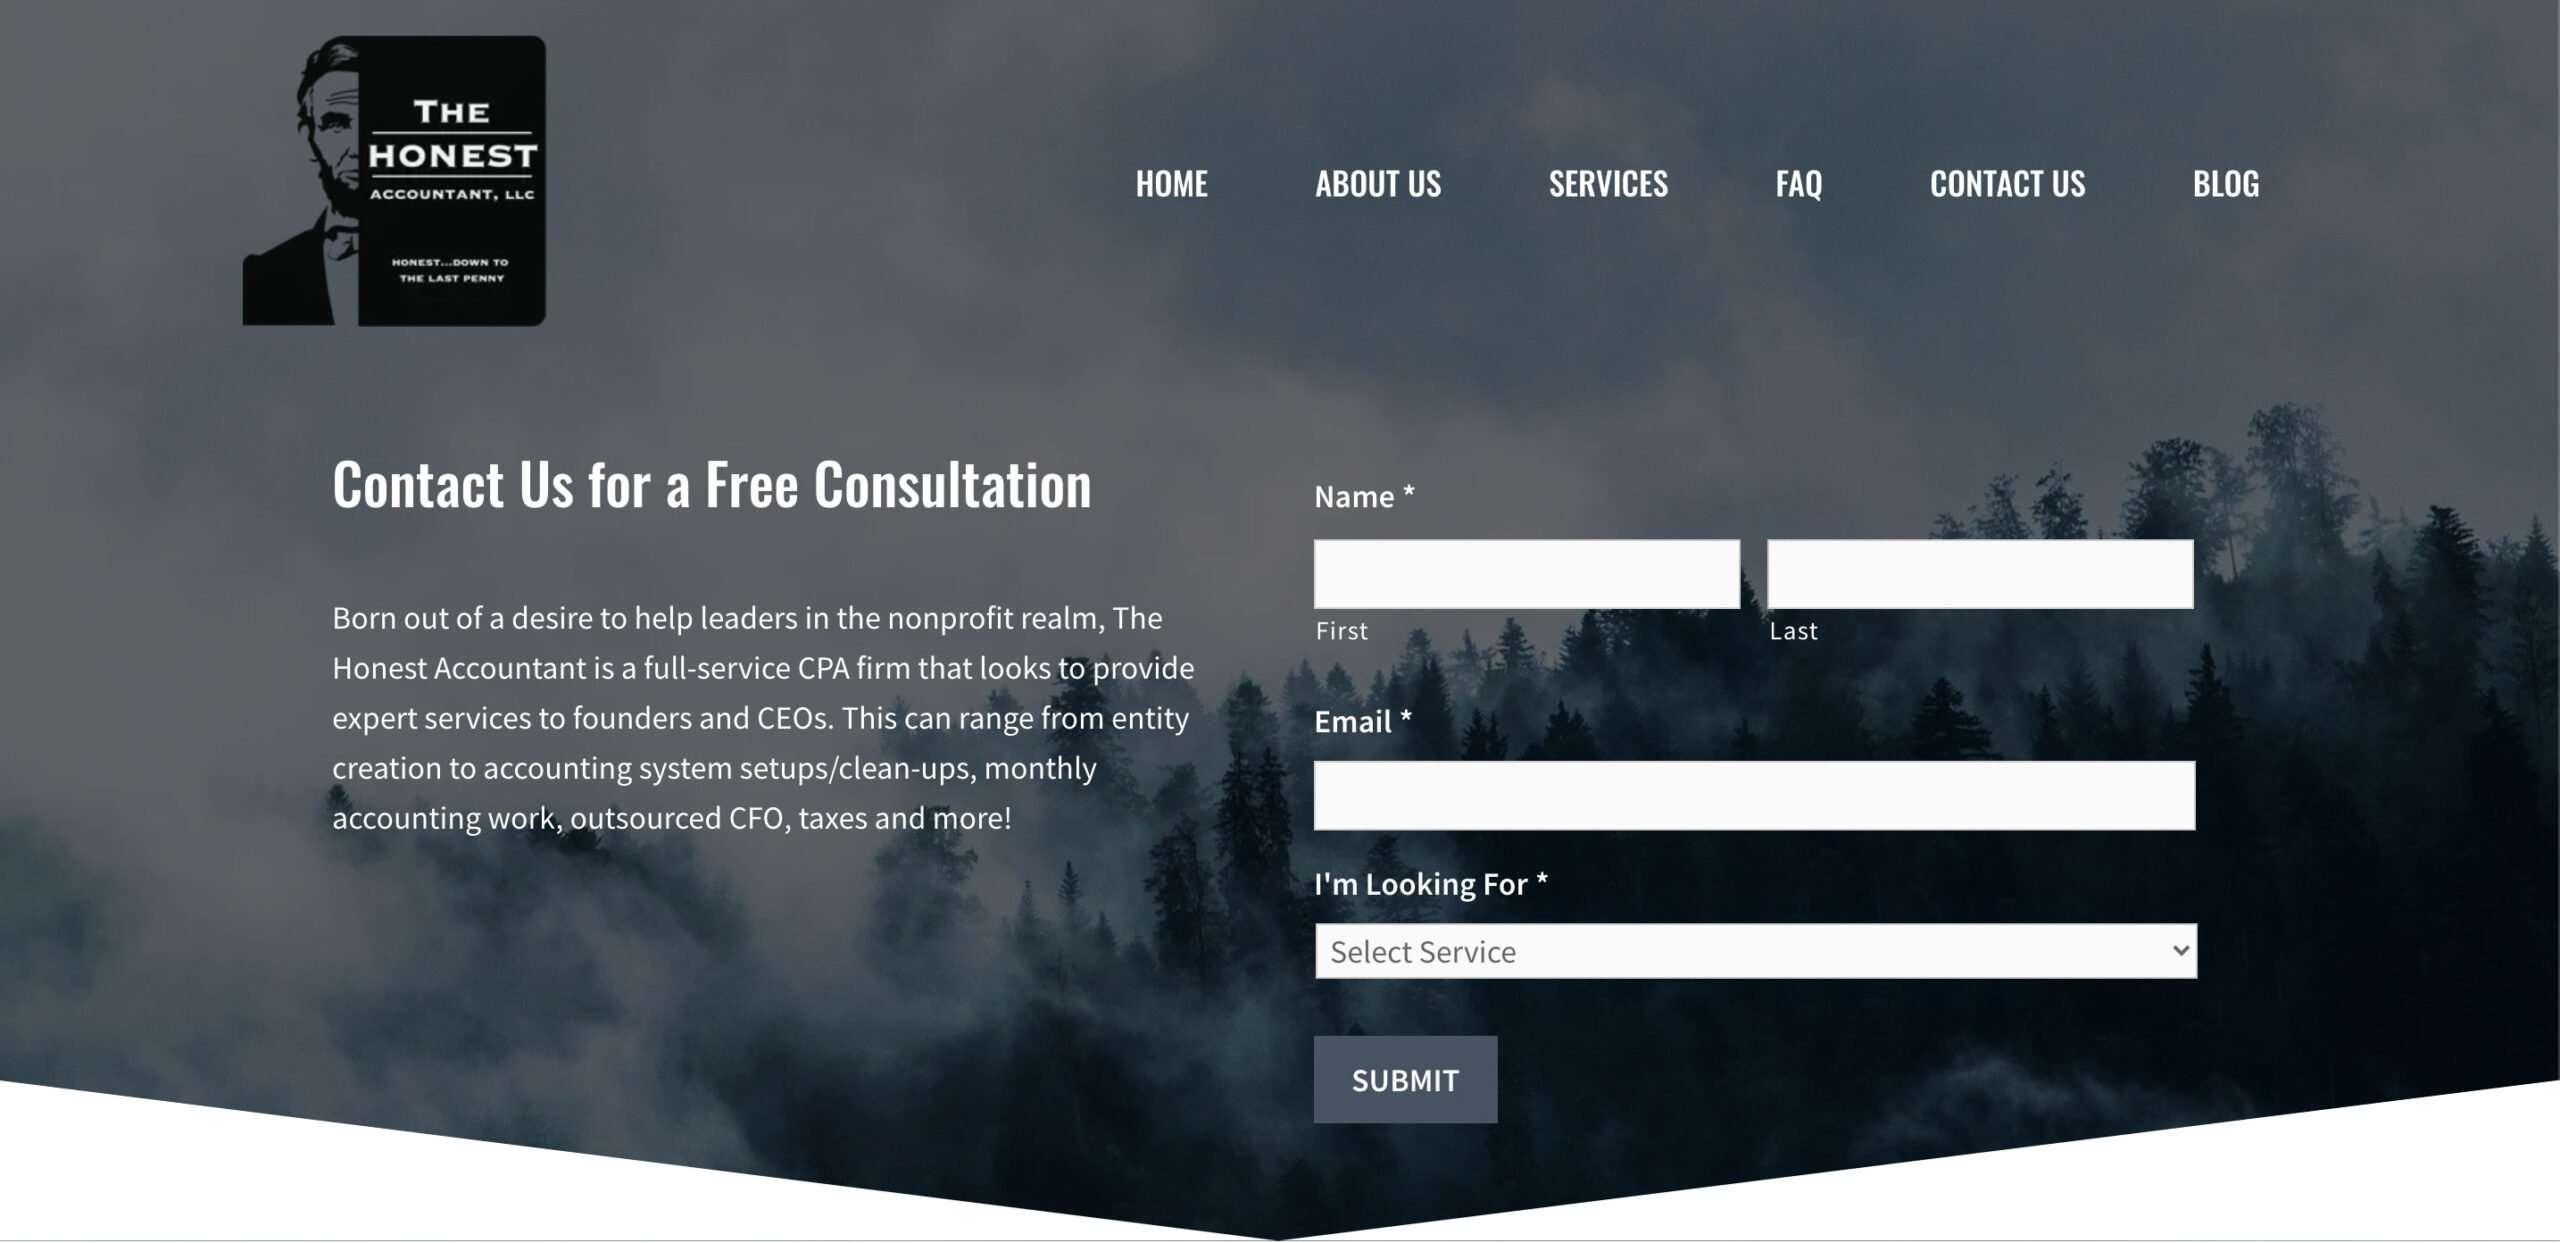 The Honest Accountant Website designed by Atlanta web design agency SkyCastle Productions